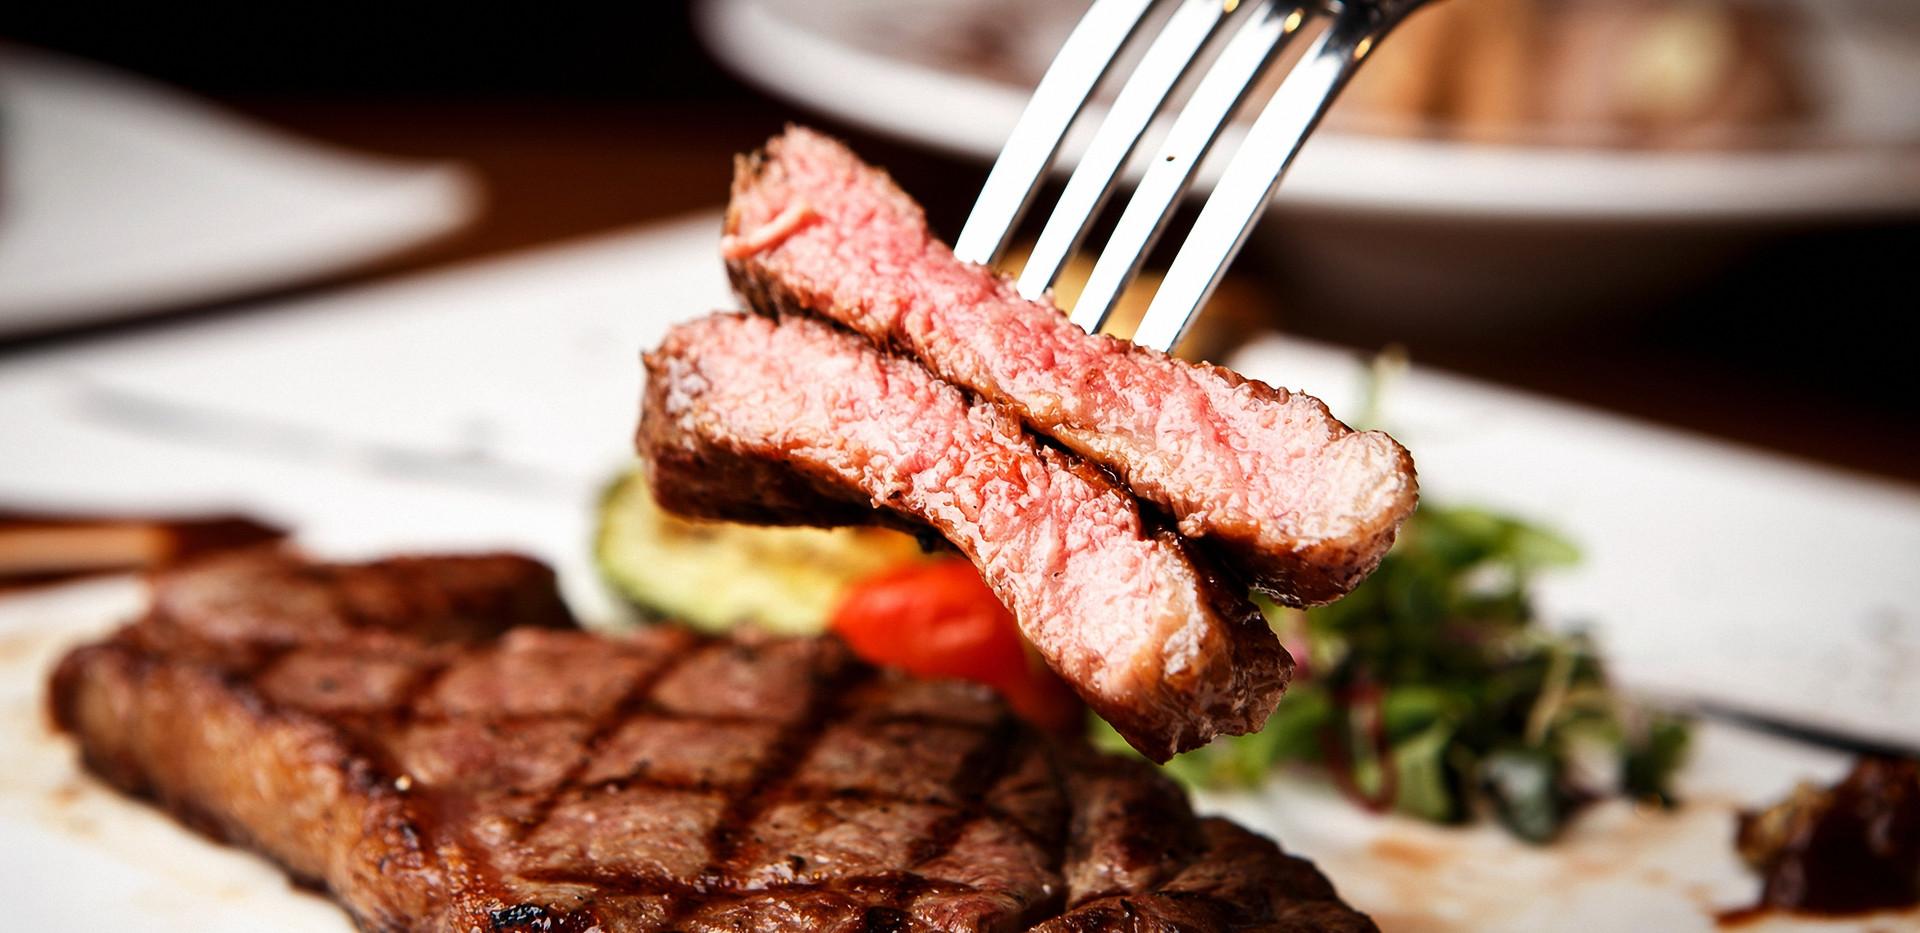 Sirloin steak on plate.jpg